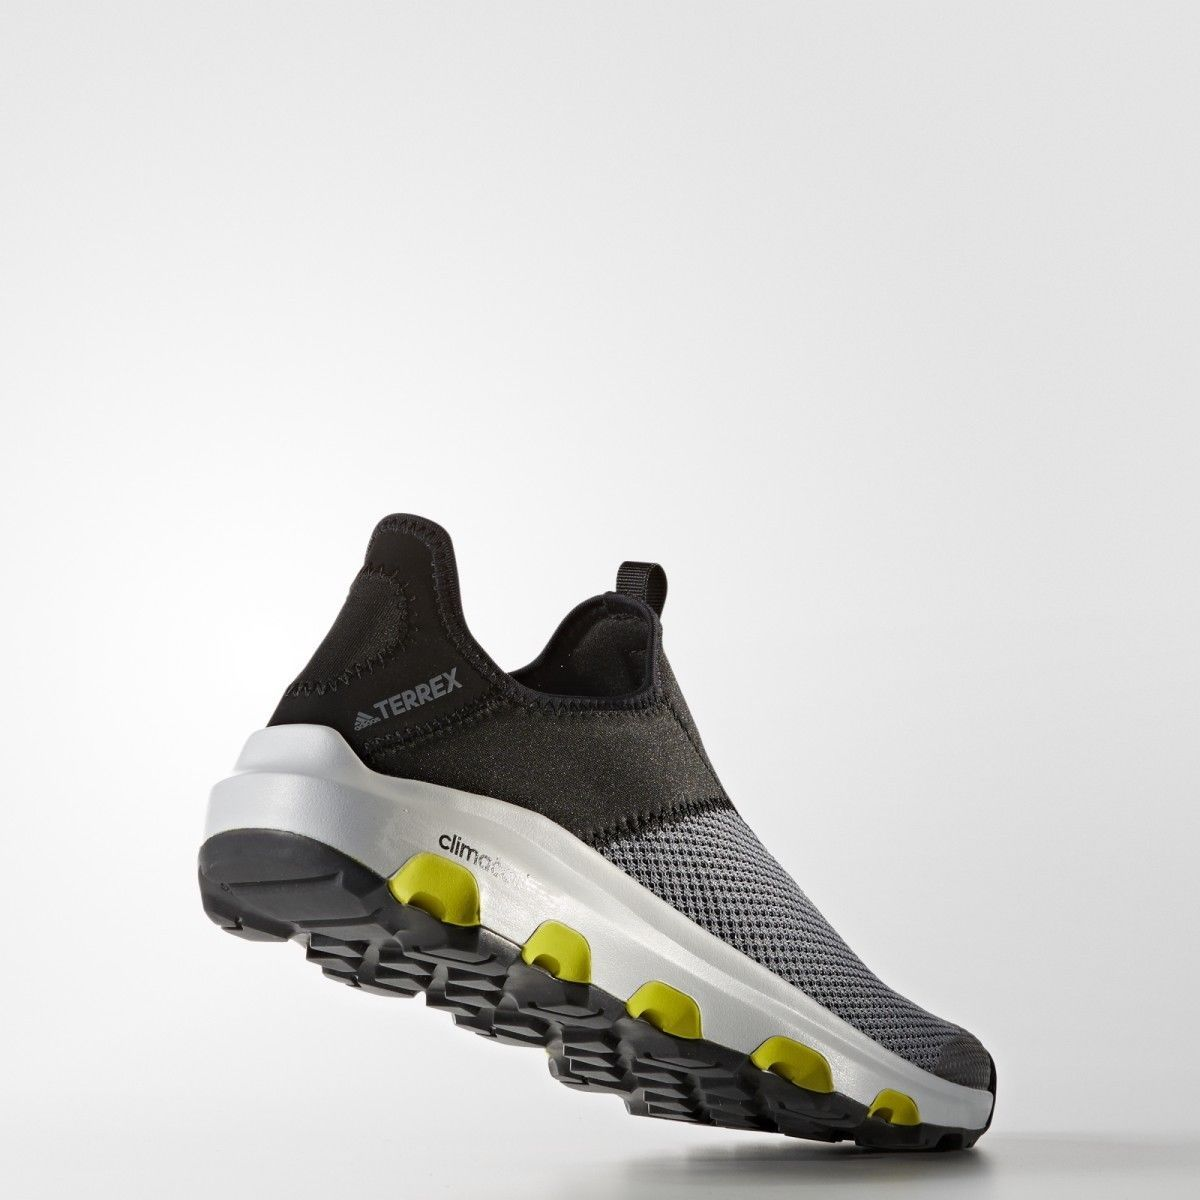 adidas Mens Terrex Traxion Climacool Water Shoes Grey/Black